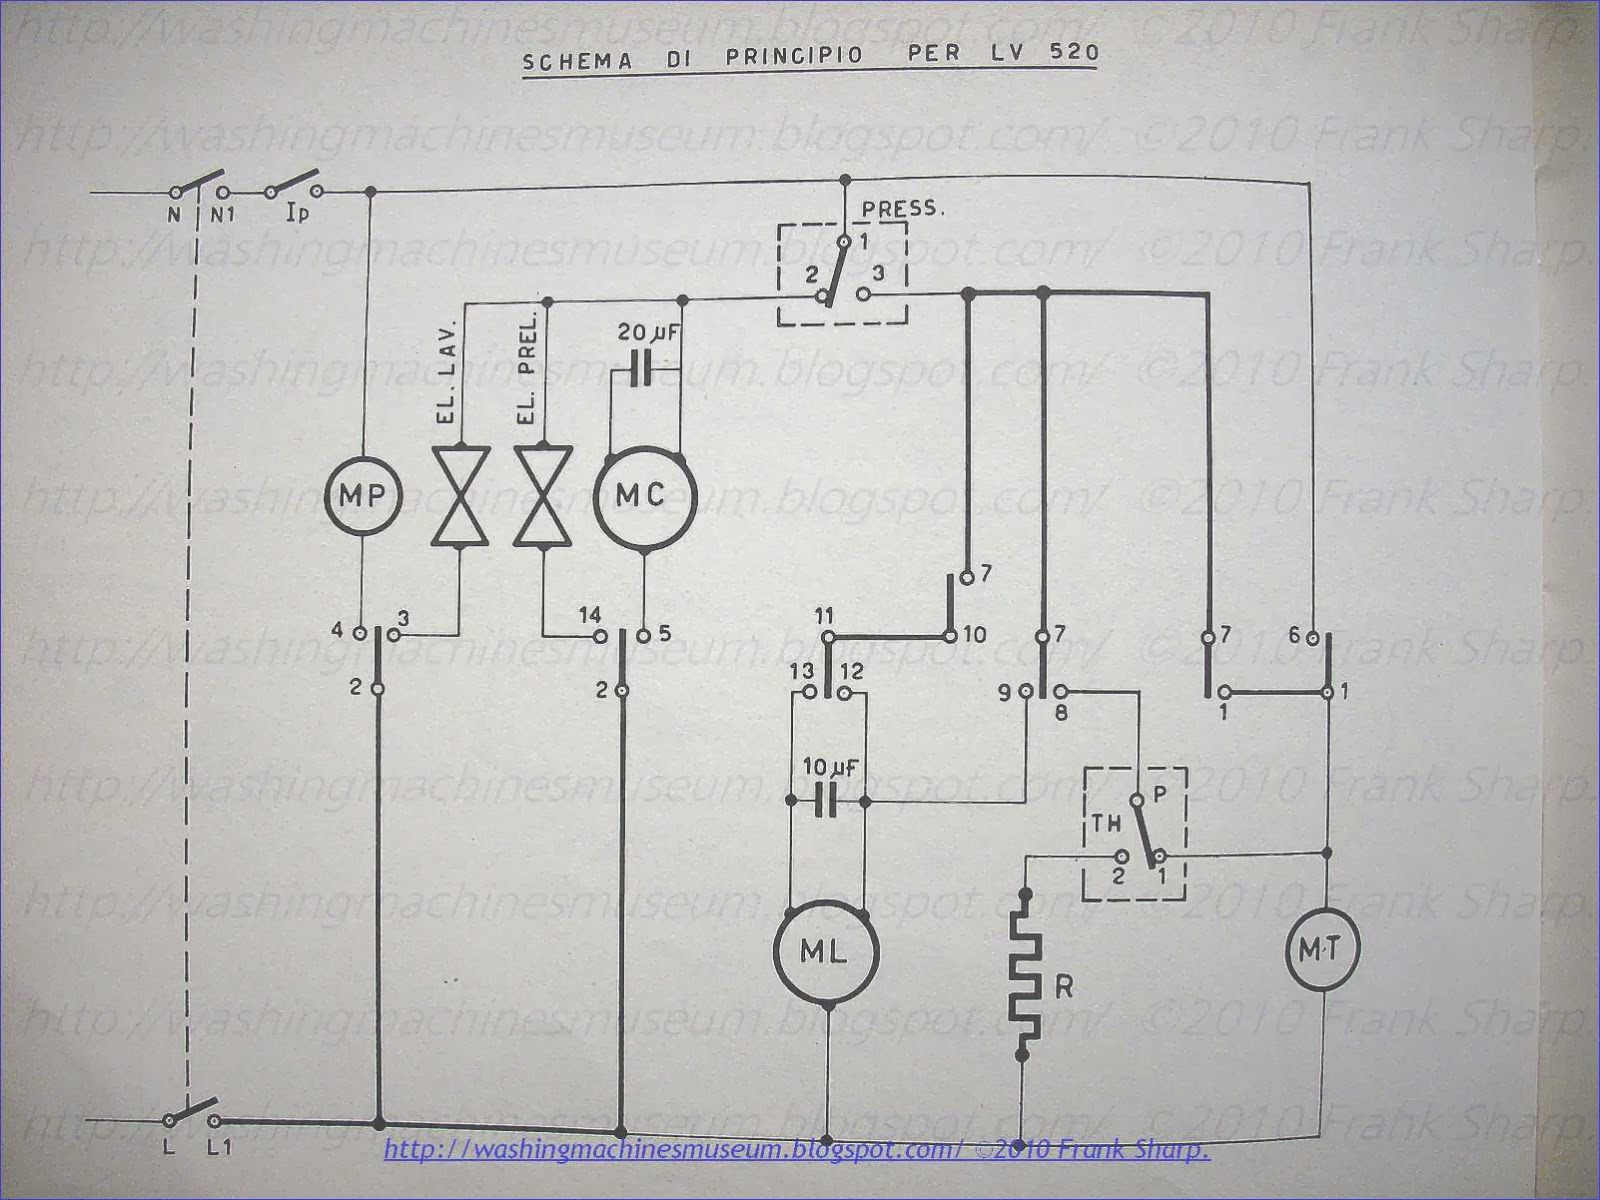 Semi Automatic Washing Machine Circuit Diagram Volvo Ec25 Wiring Diagram Pipiing 2014ok Jeanjaures37 Fr